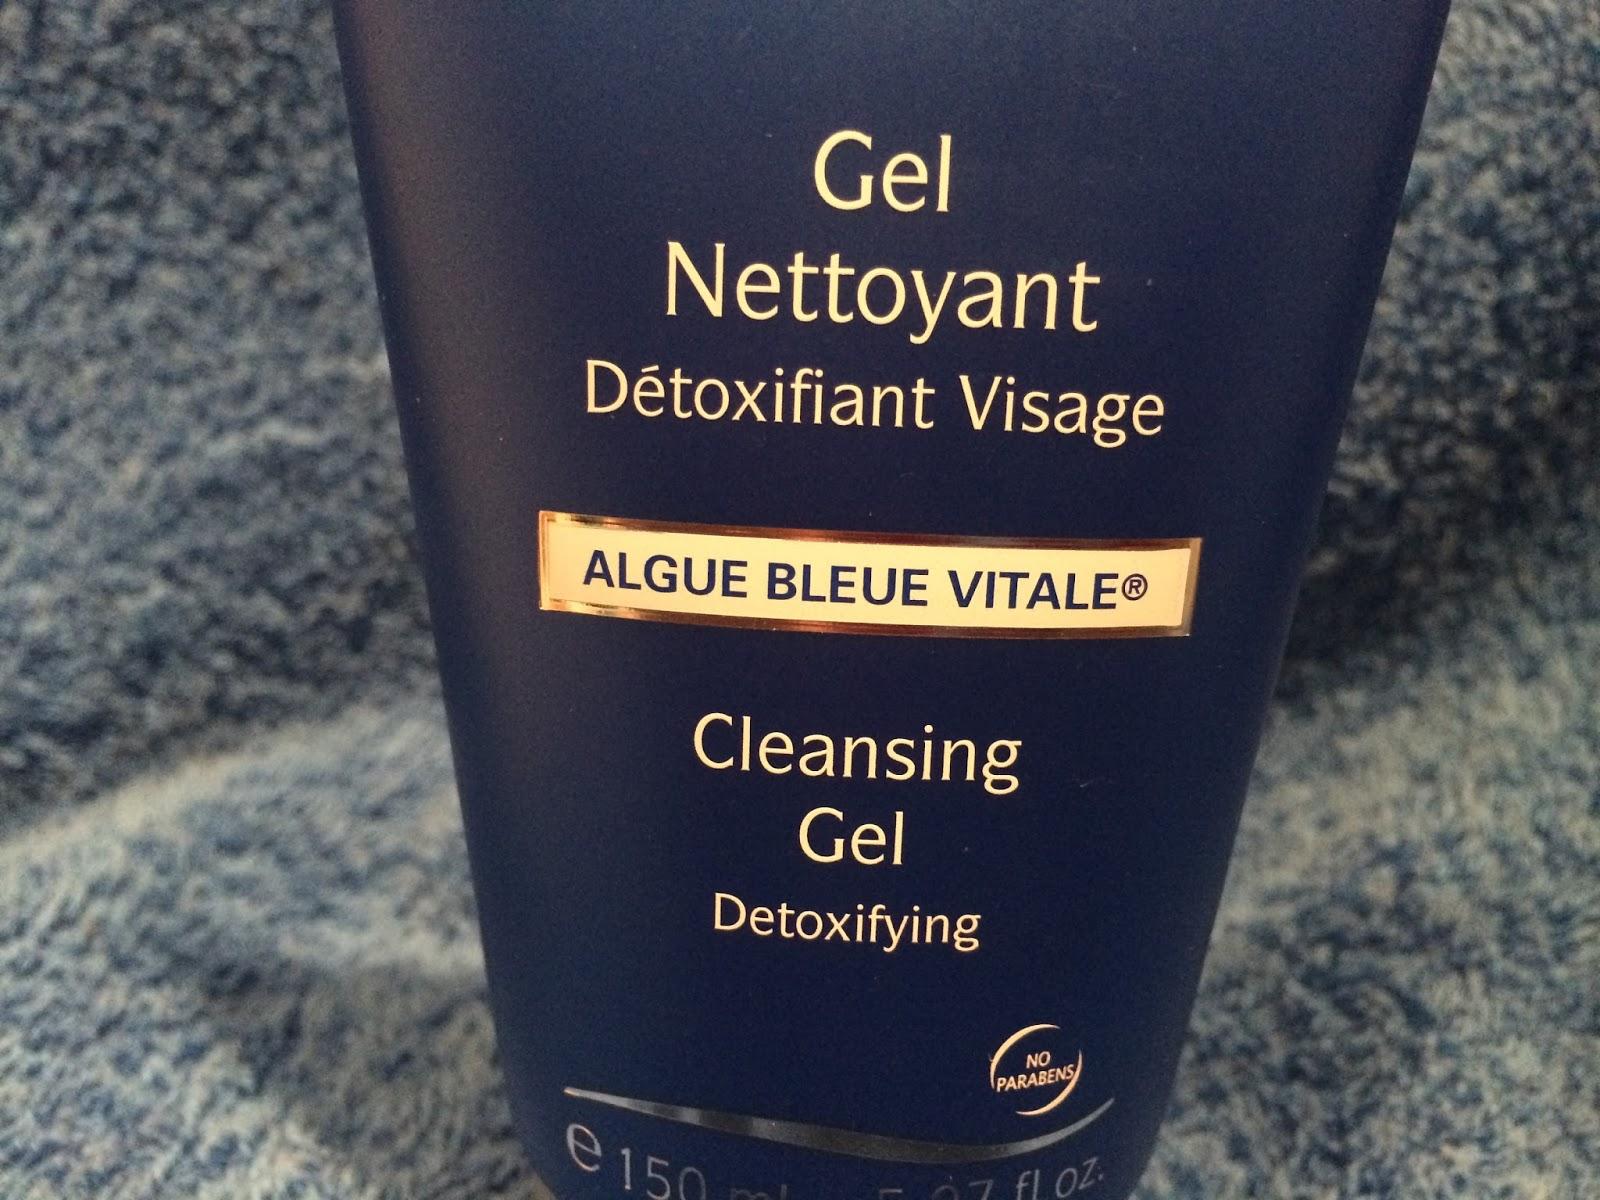 Thalgo Gel Nettoyant Detoxifiant Visage